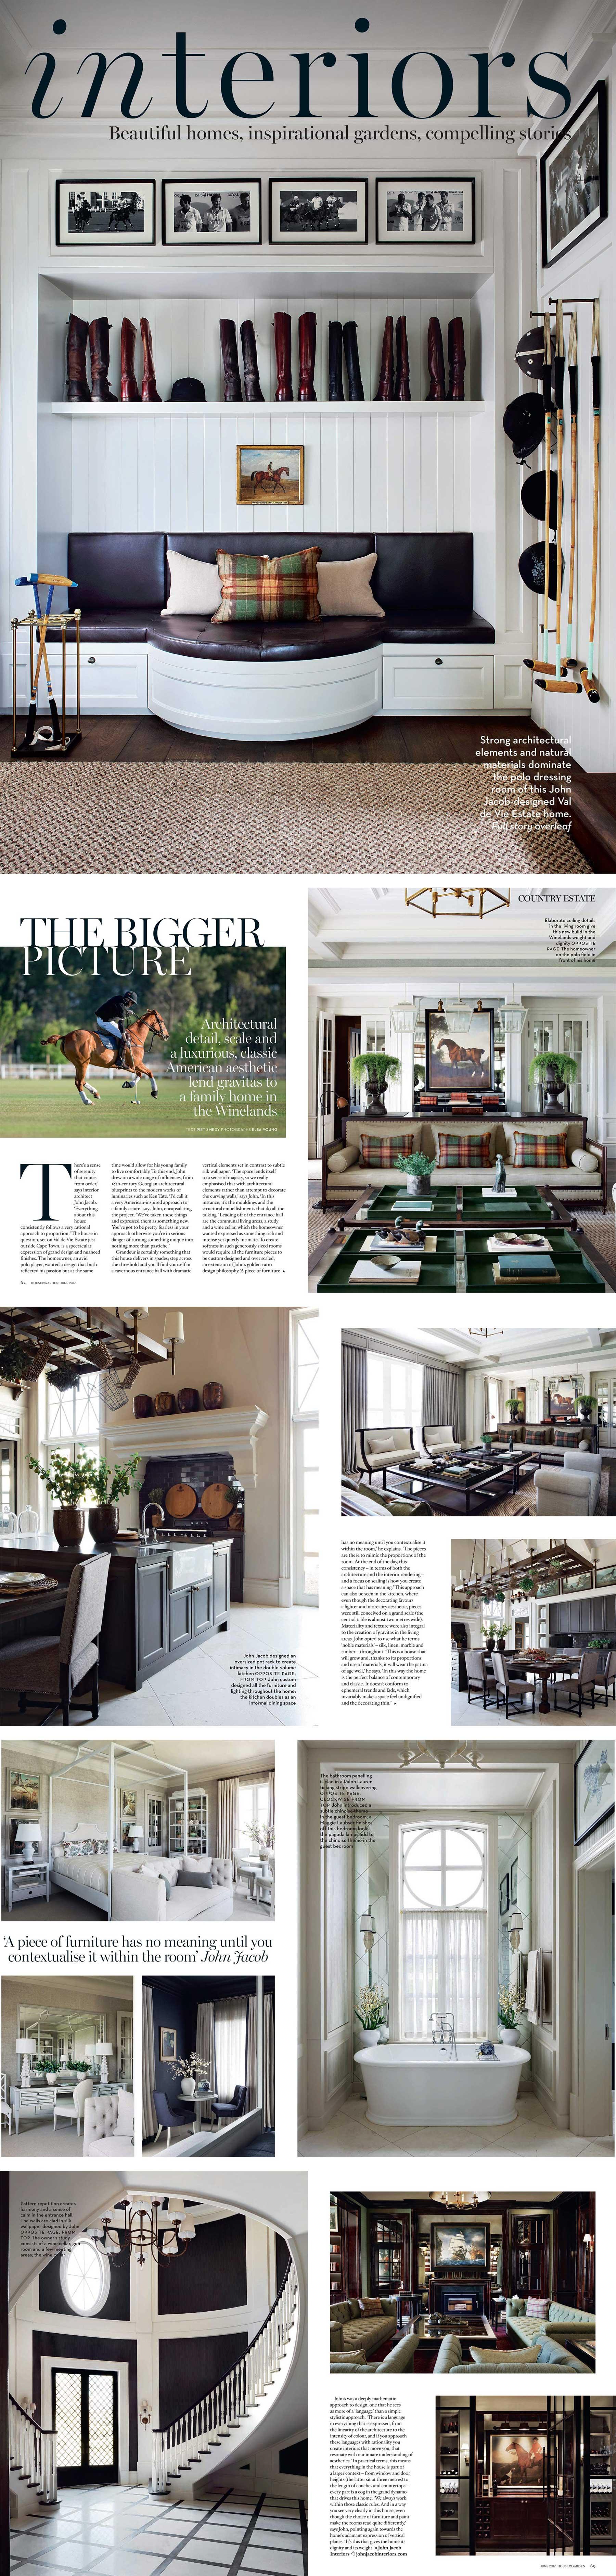 Inspirational Home Interiors Garden. Inspiring People, Home Tour ...